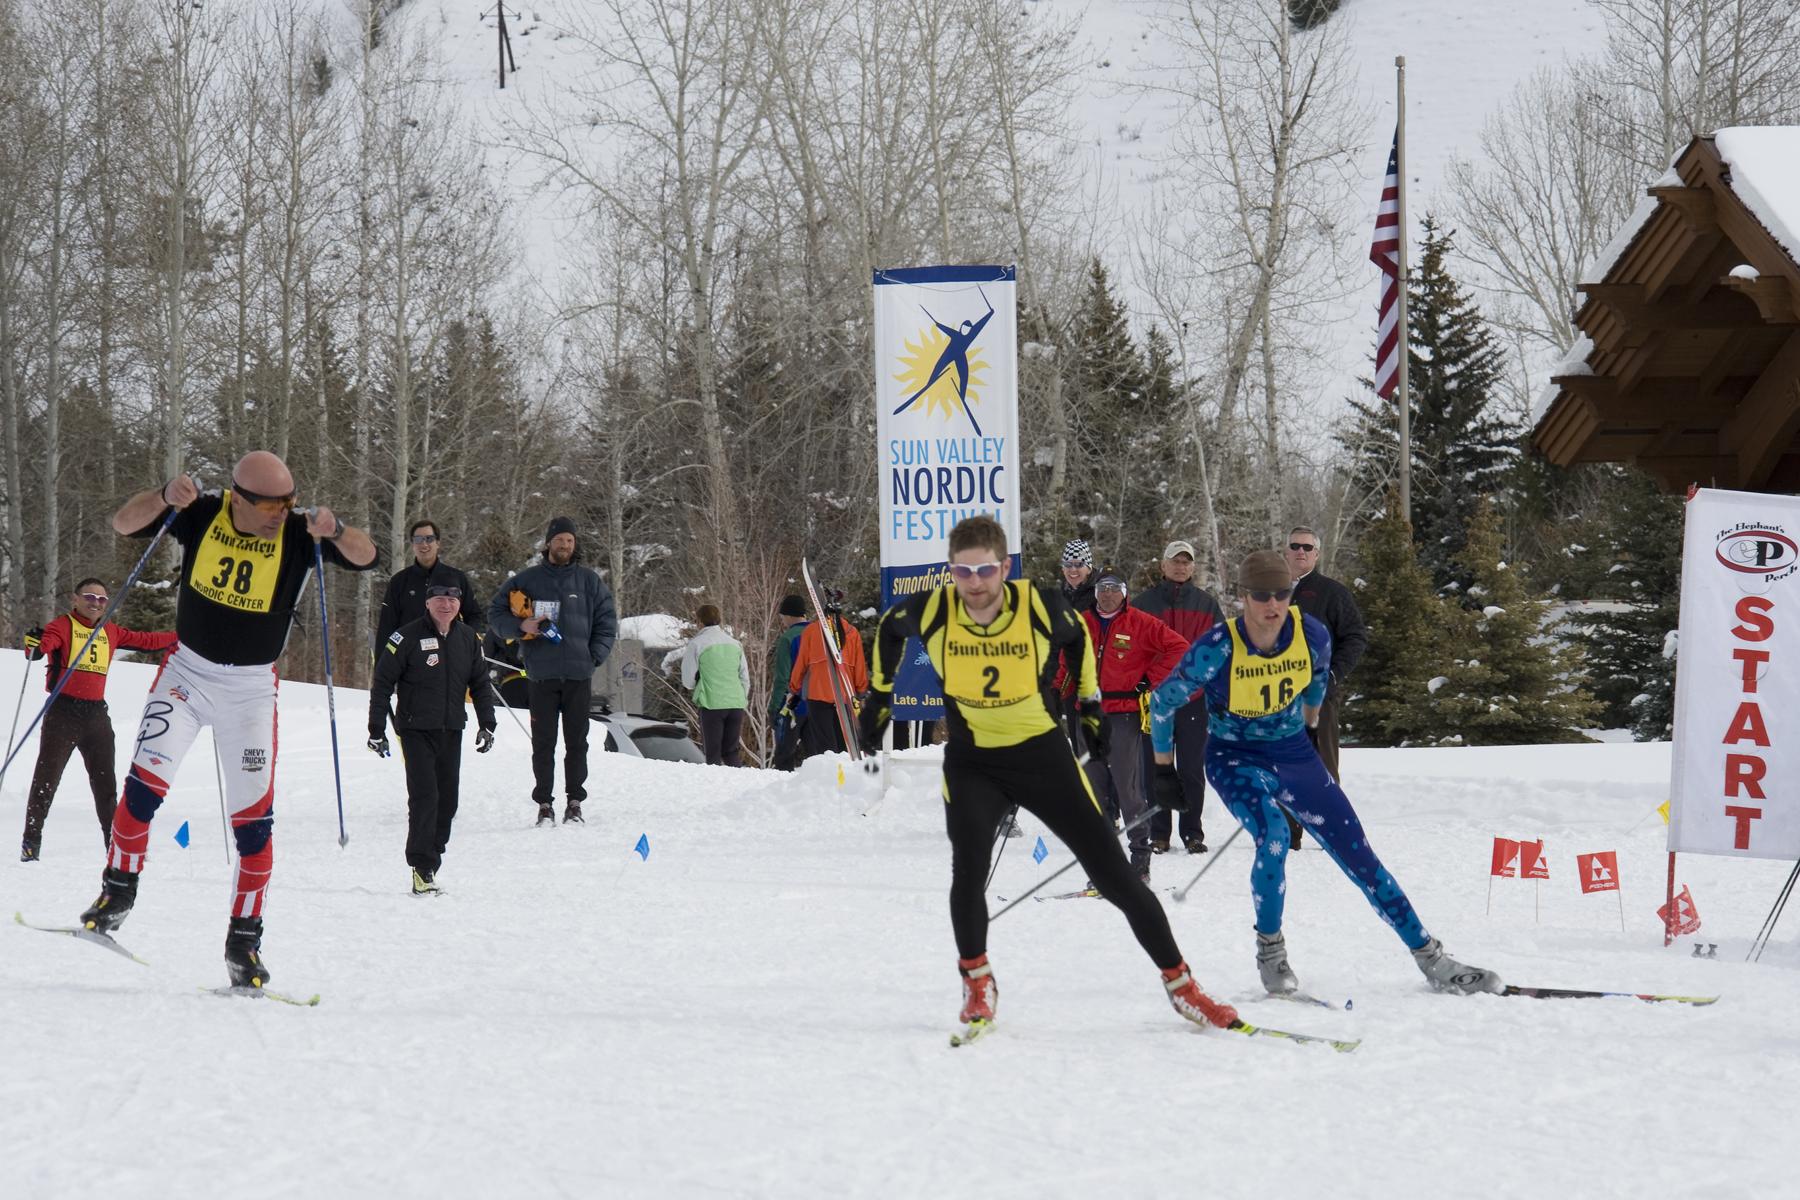 SV-Nordic-Festival-Sprint-Snowshoe-Races_020310_3585_NR.jpg